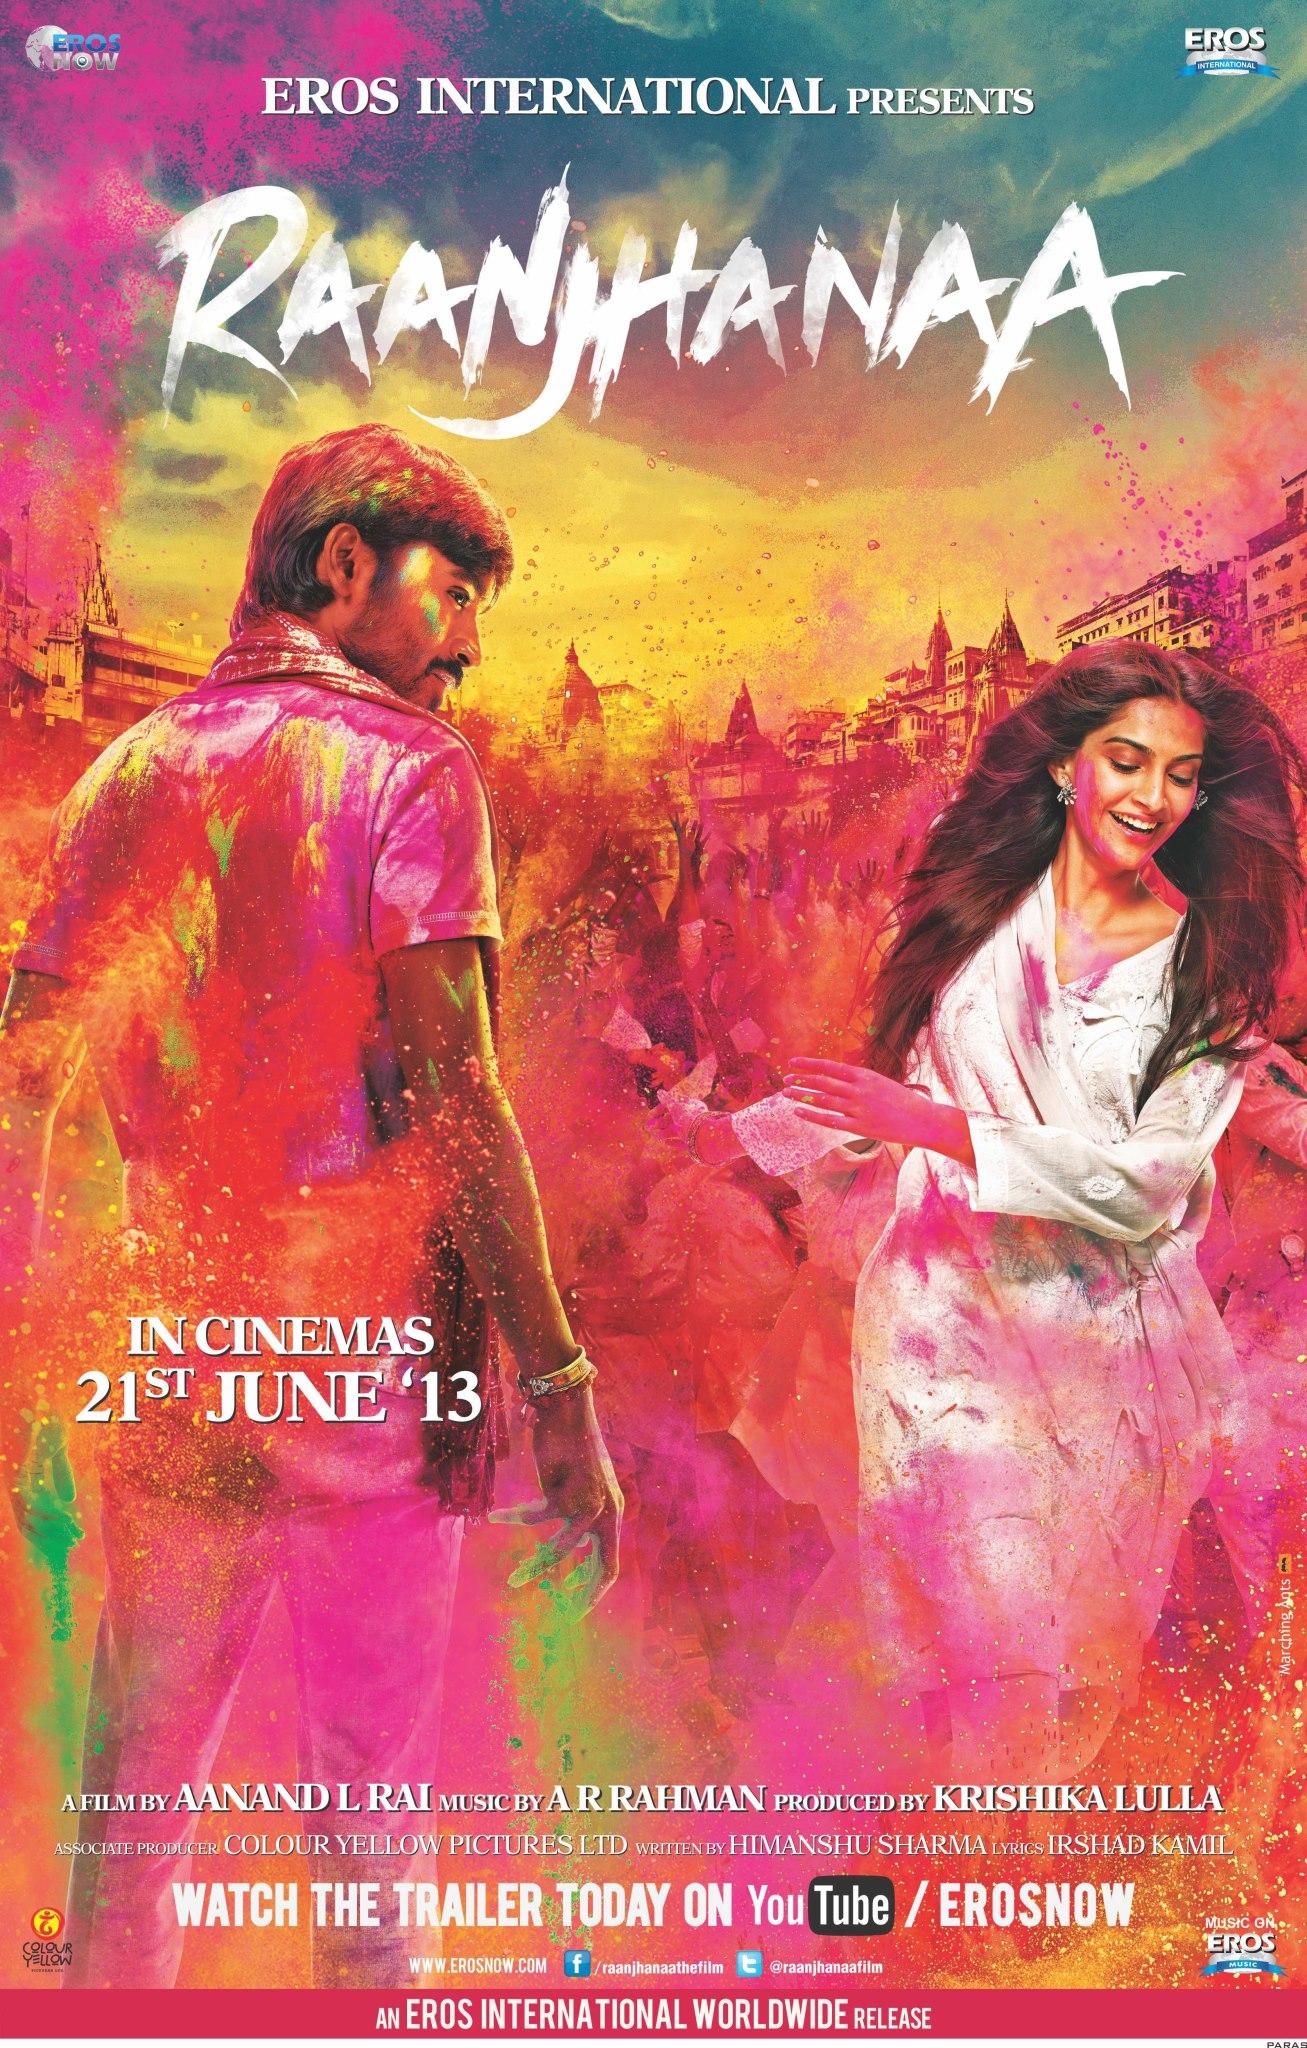 Raanjhanaa - Movie Poster #1 (Original)